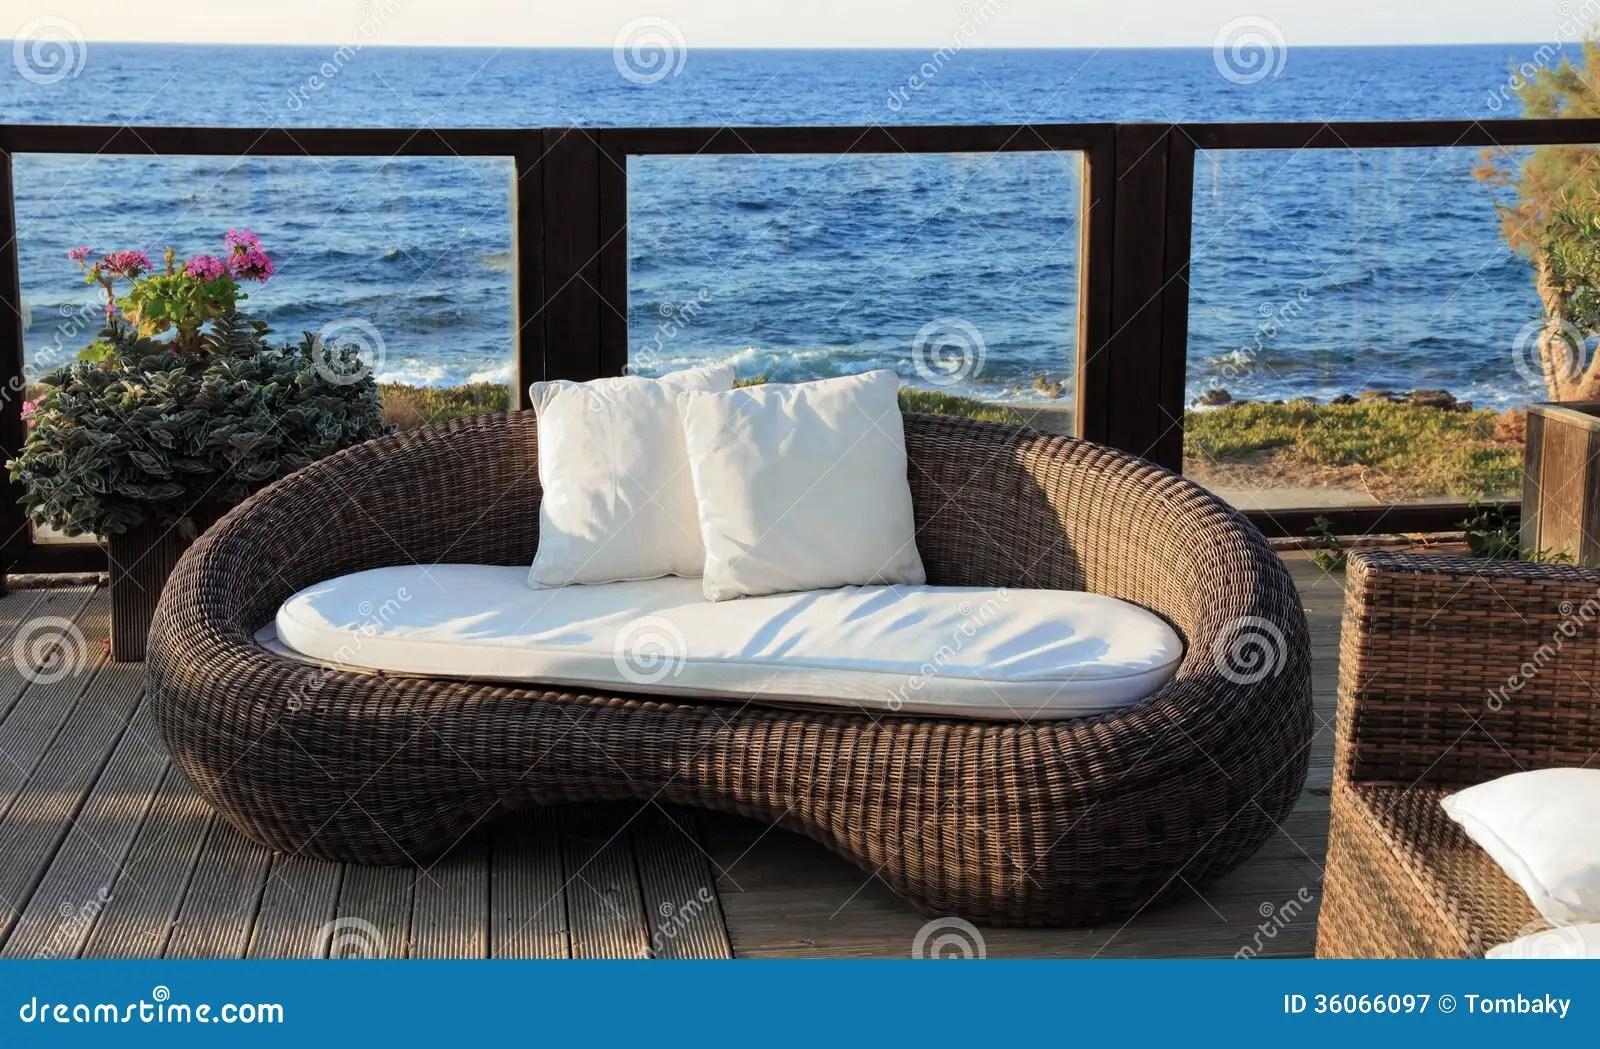 A Modern Wicker Garden Sofa Stock Image  Image of green